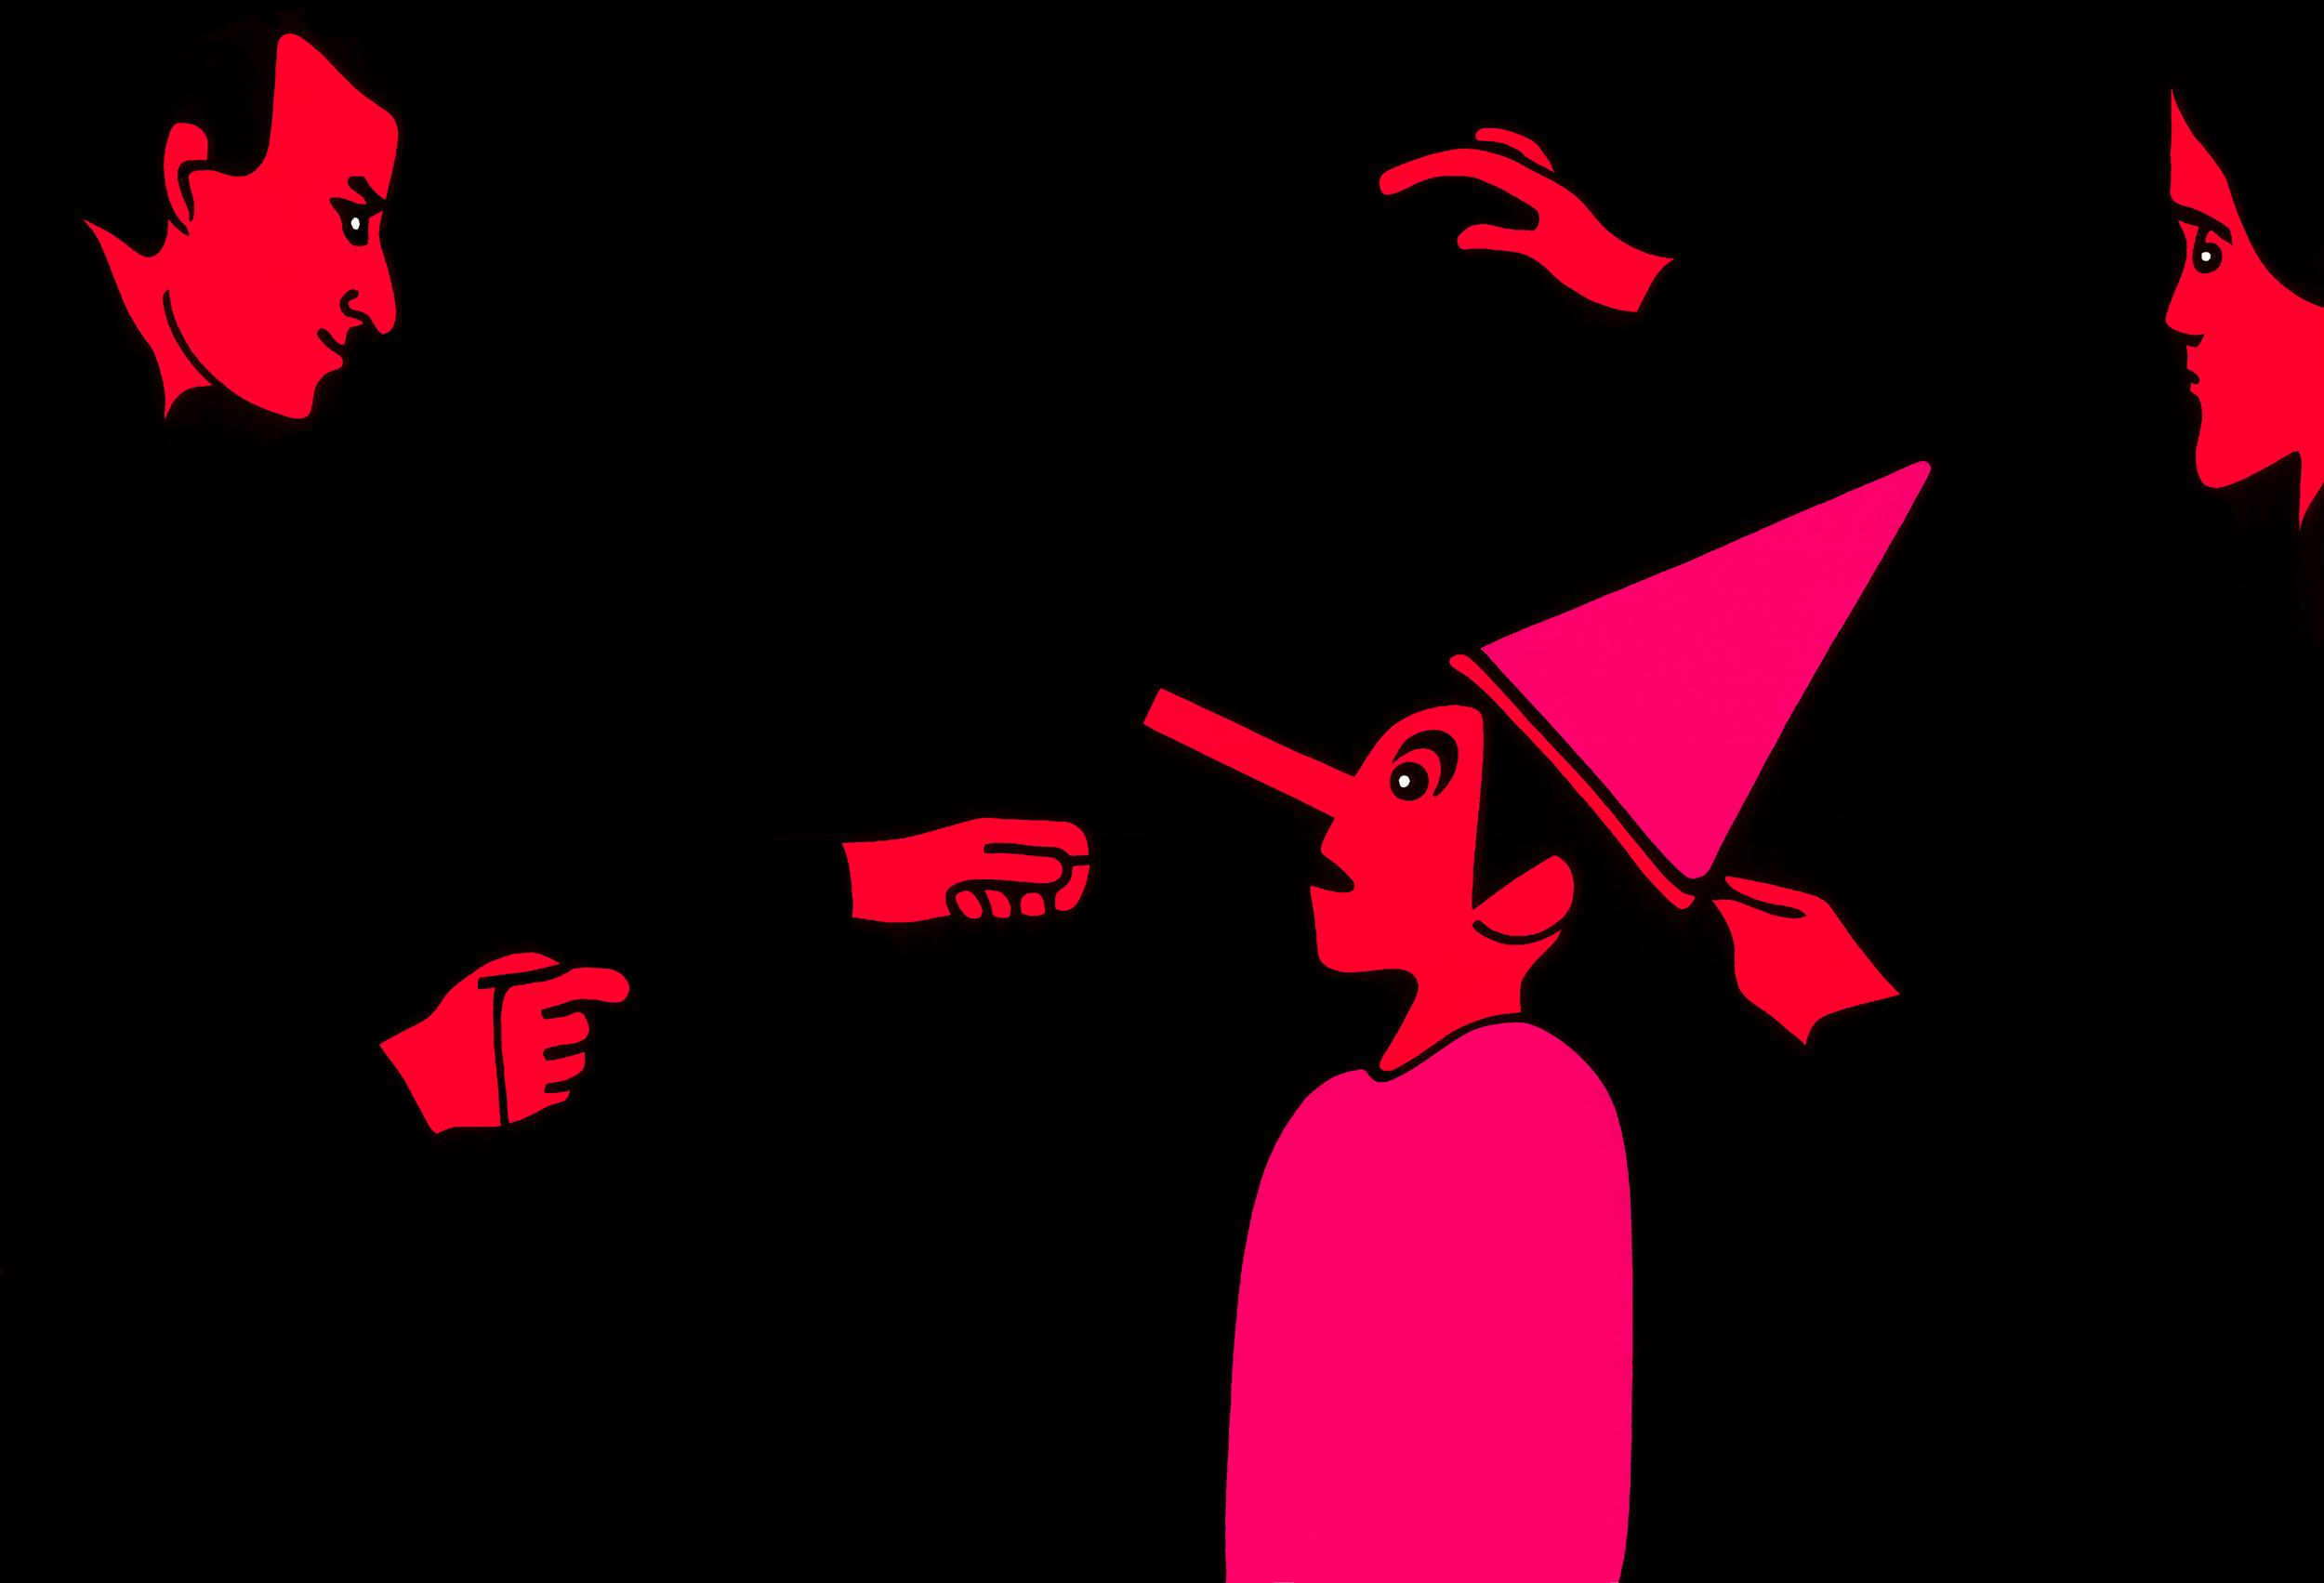 Mocking I, print by Wouter van Riessen